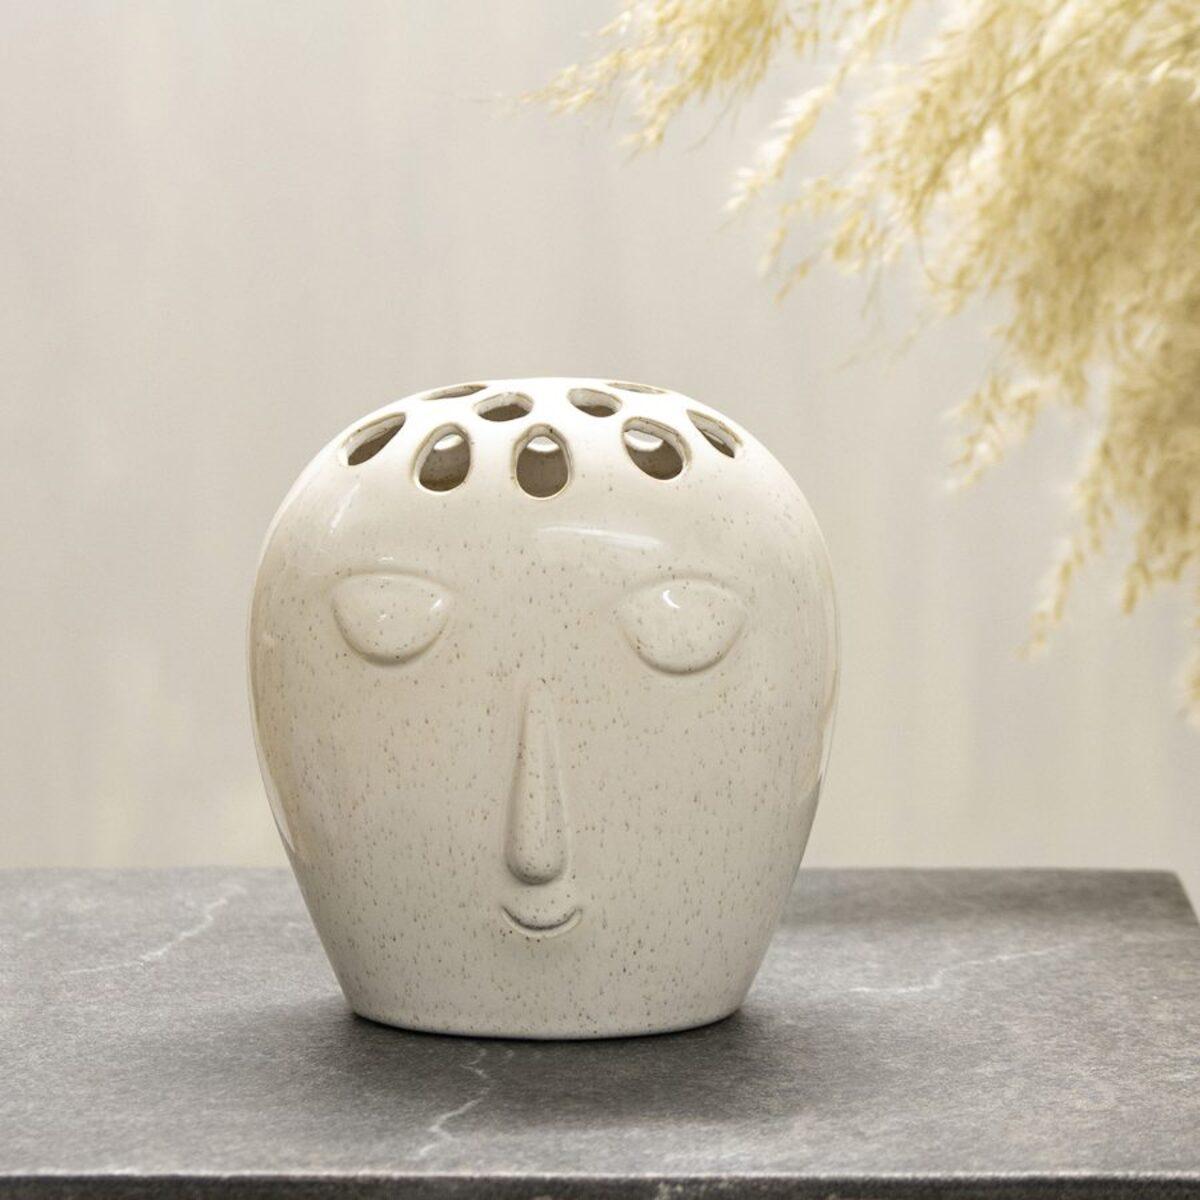 Bild 5 von LIVING ART     Keramik Sortiment